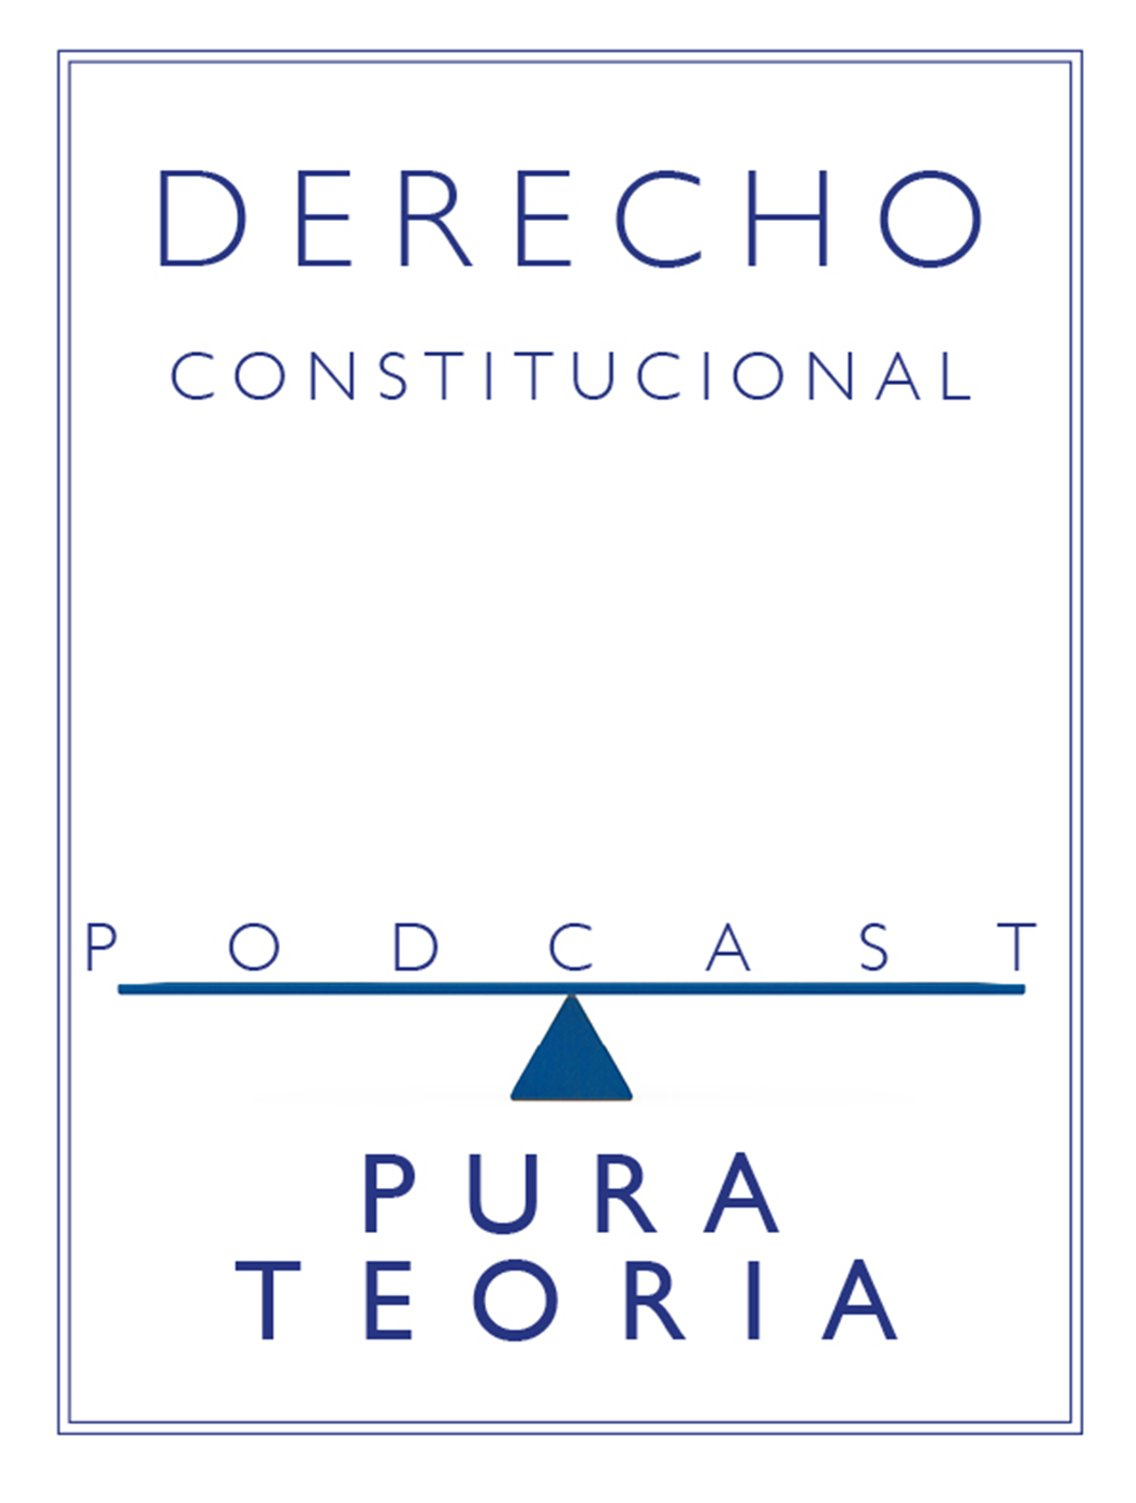 Derecho Constitucional II UAH - immagine di copertina